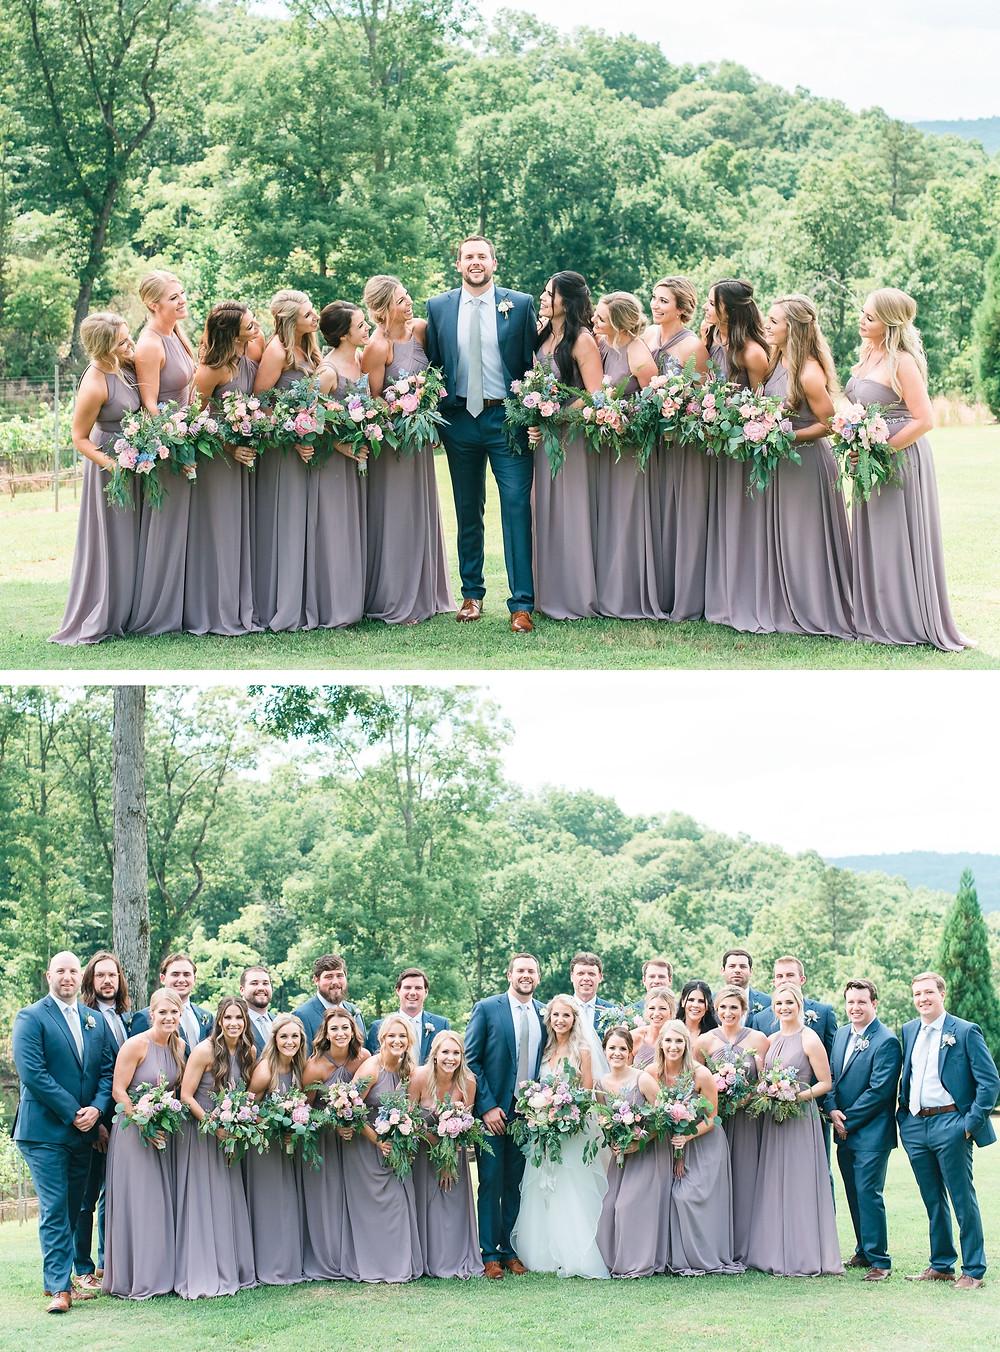 blue-mountain-vineyard-wedding-venue-outdoor-wedding-ceremony-david-andrew-patriot-cetner-football-player